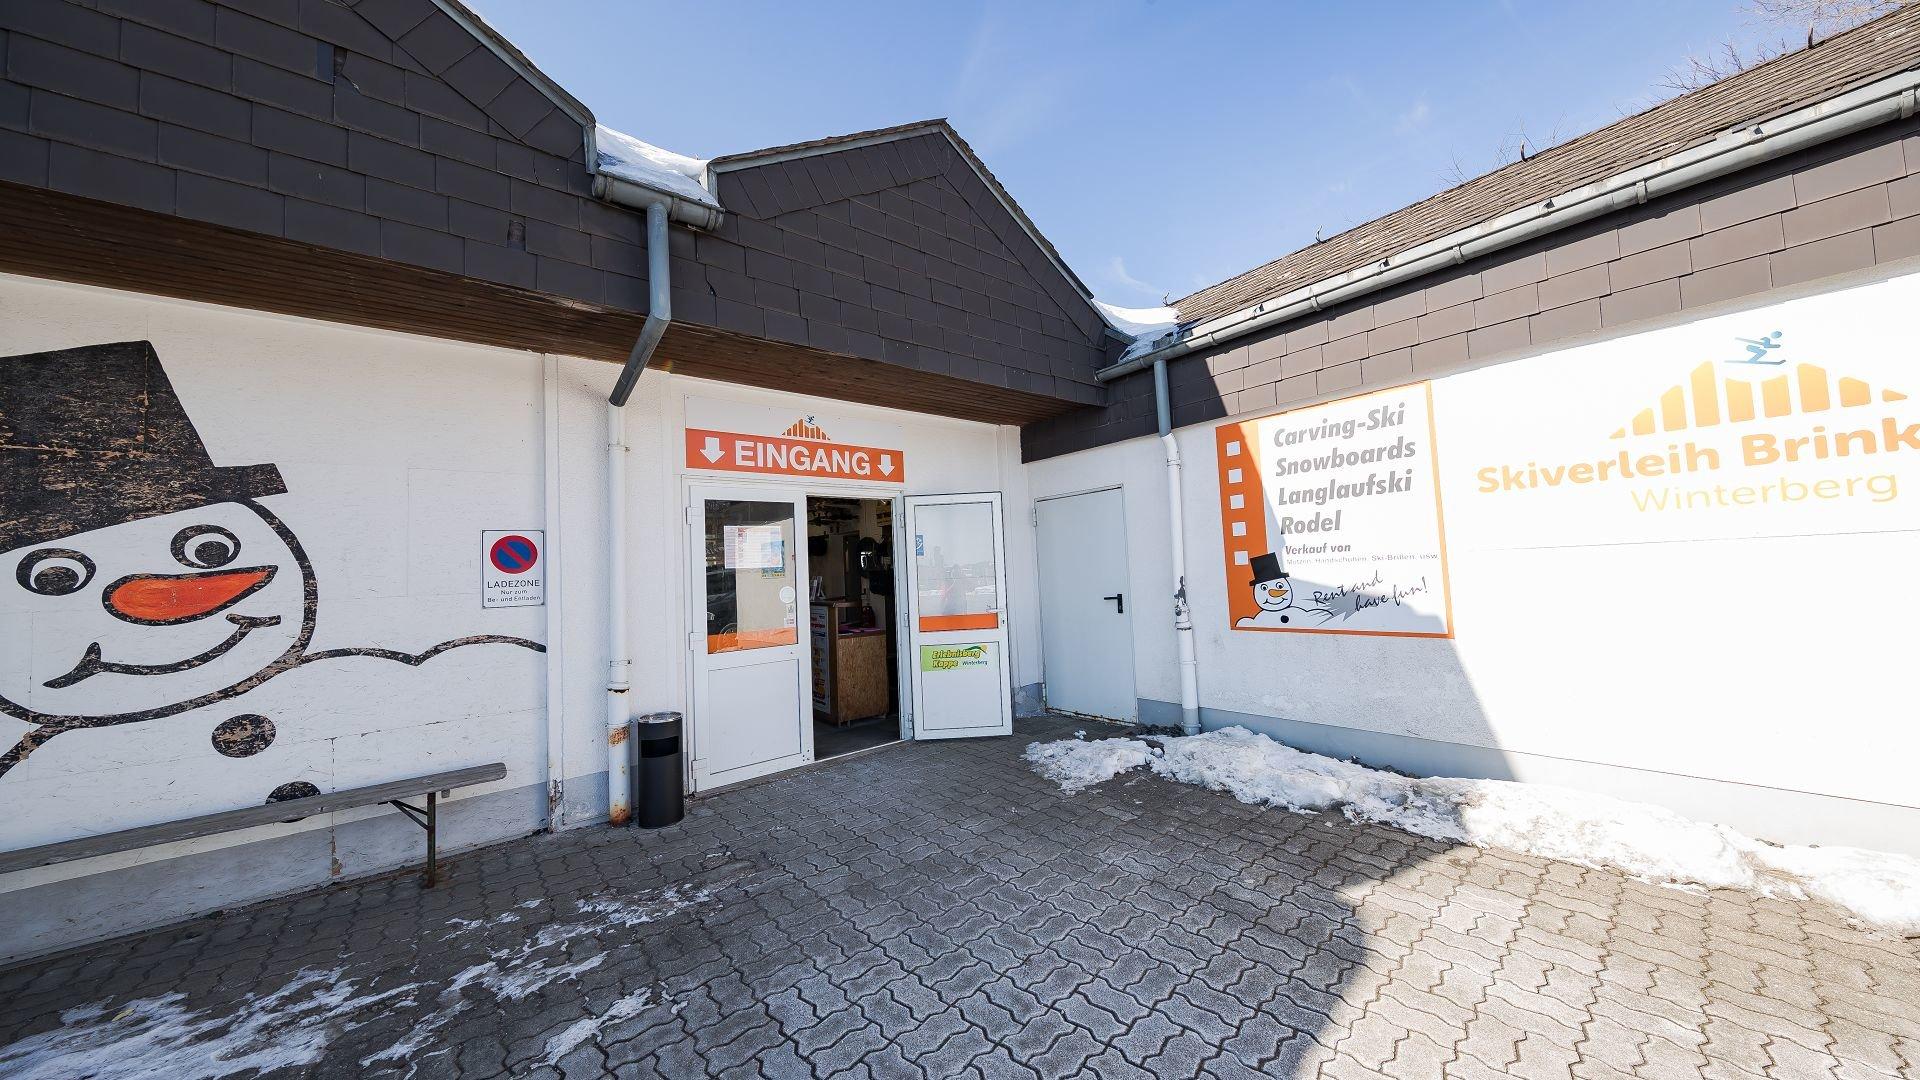 Skiverleih Brinkmann - Filiale 4 - Gewerbegebiet Remmeswiese 28